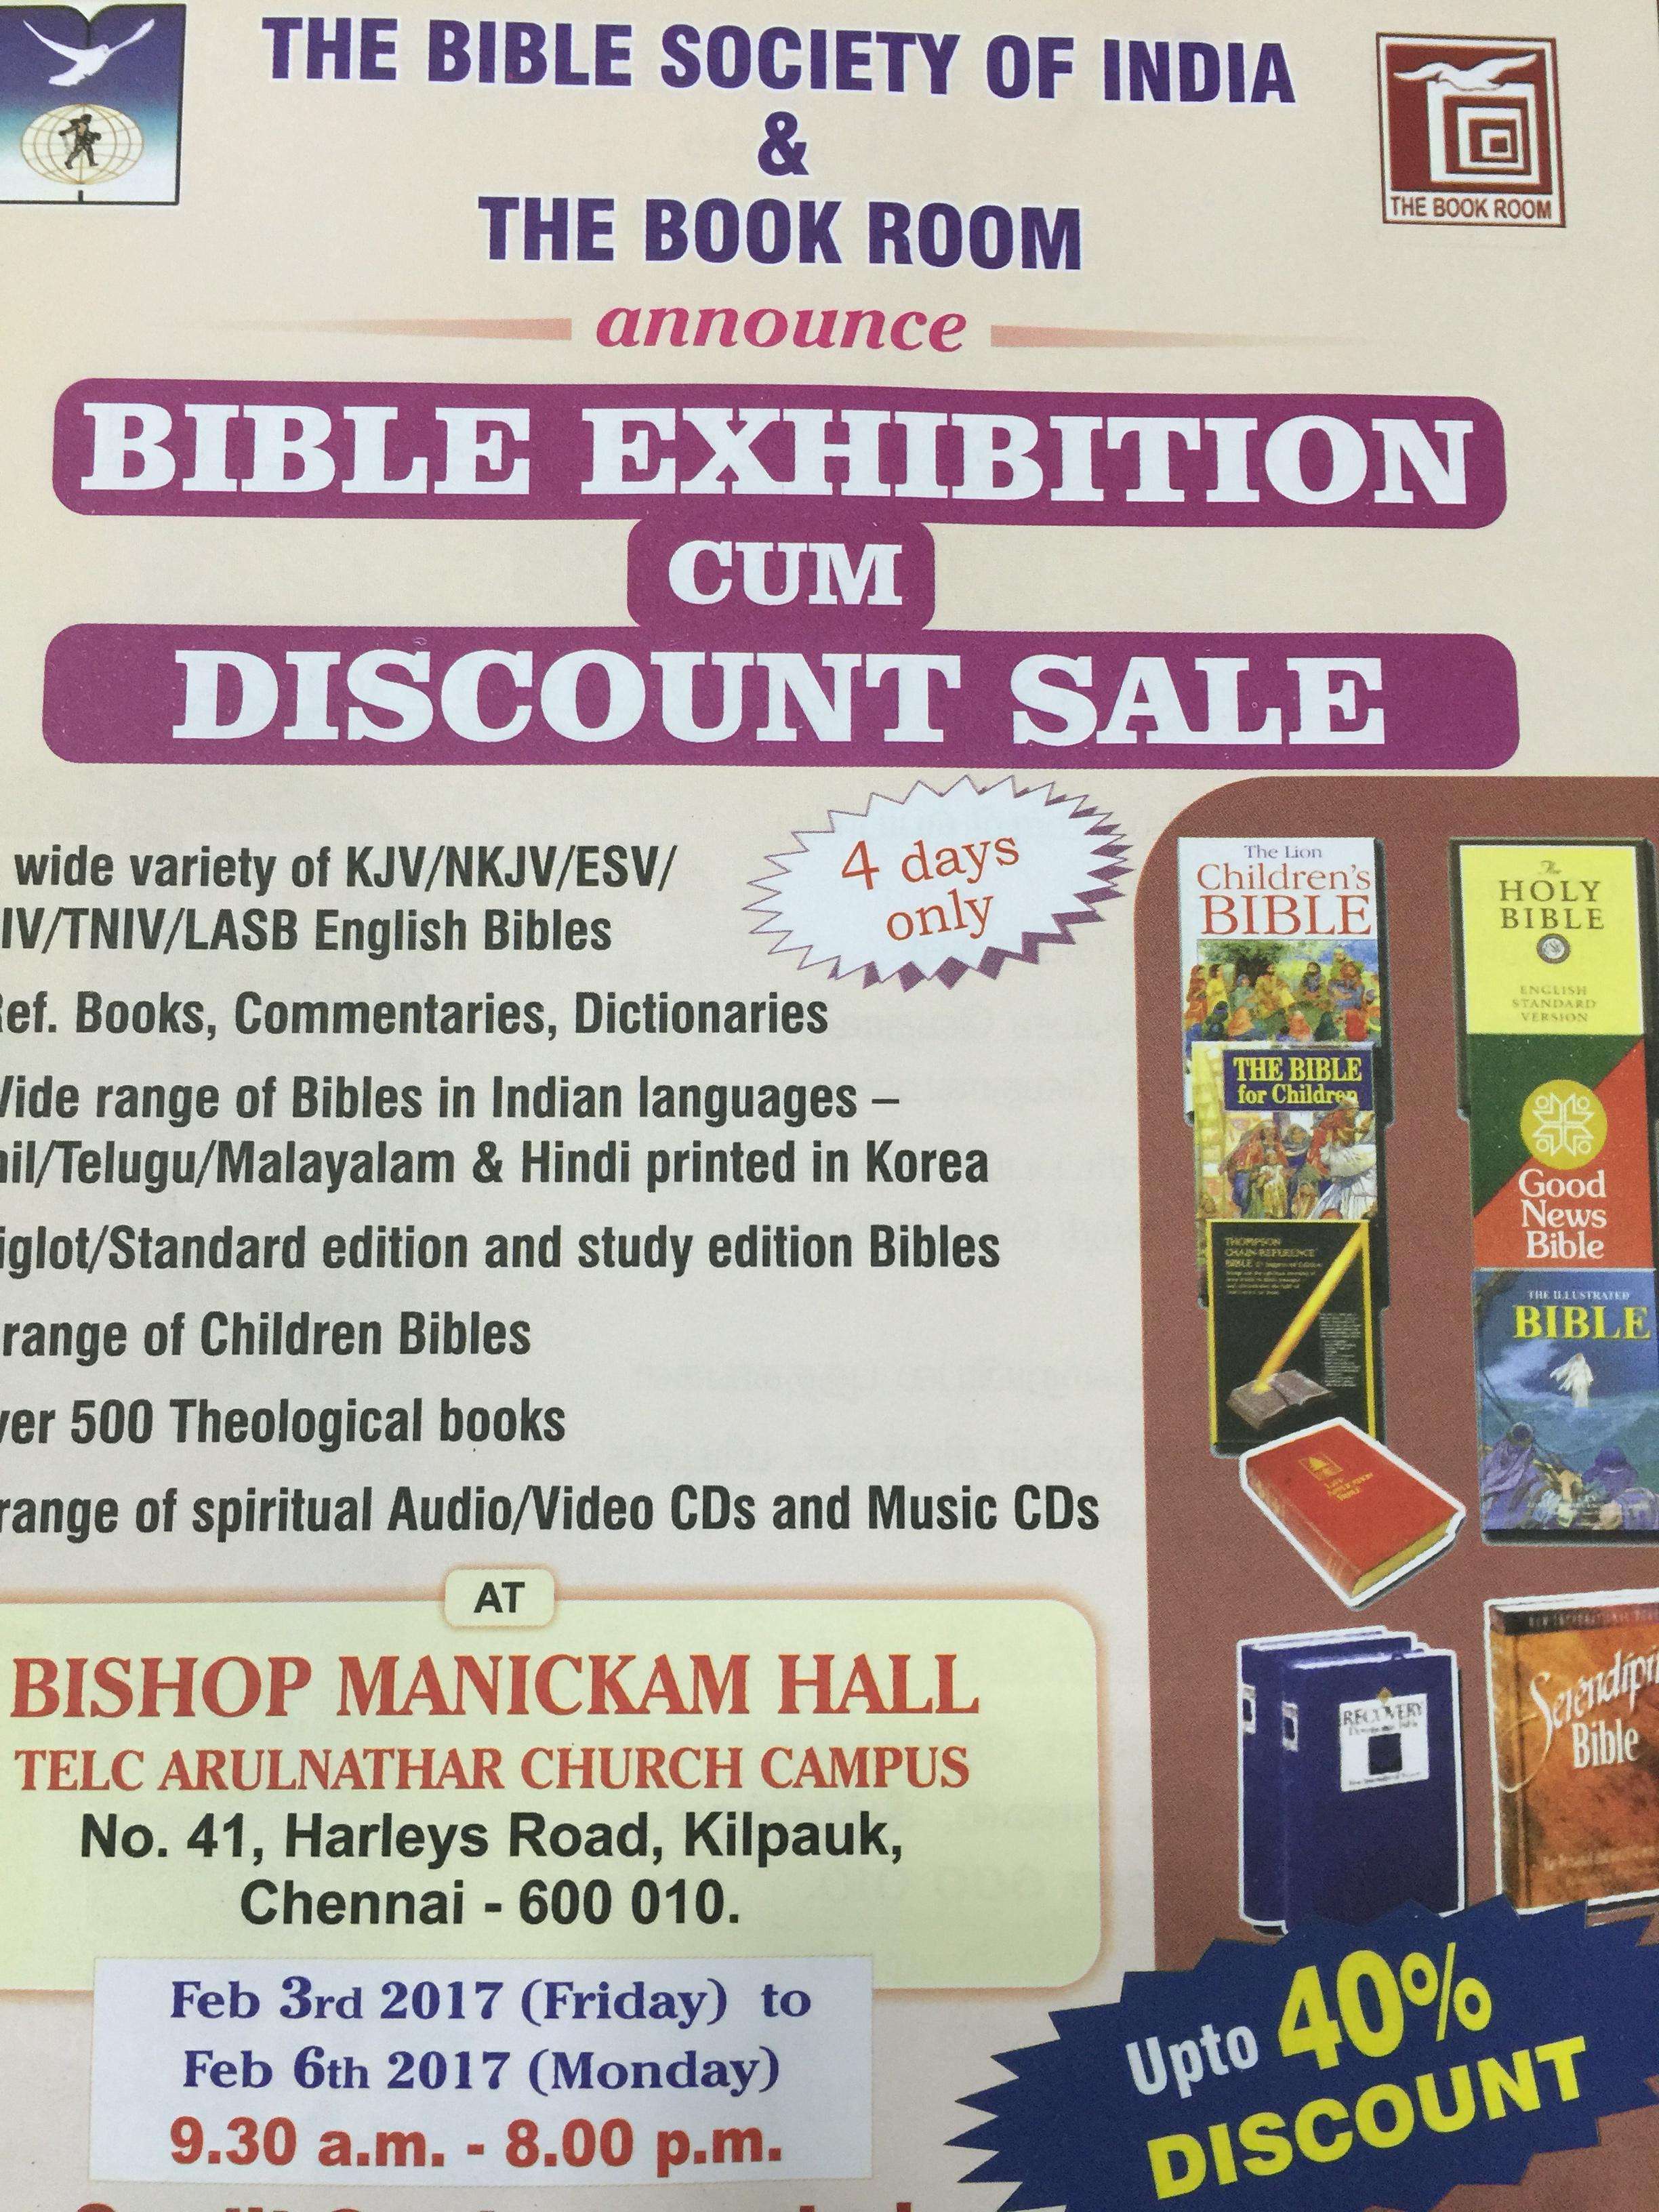 Chennai Bible Fair 2017 – The Bible Society of India